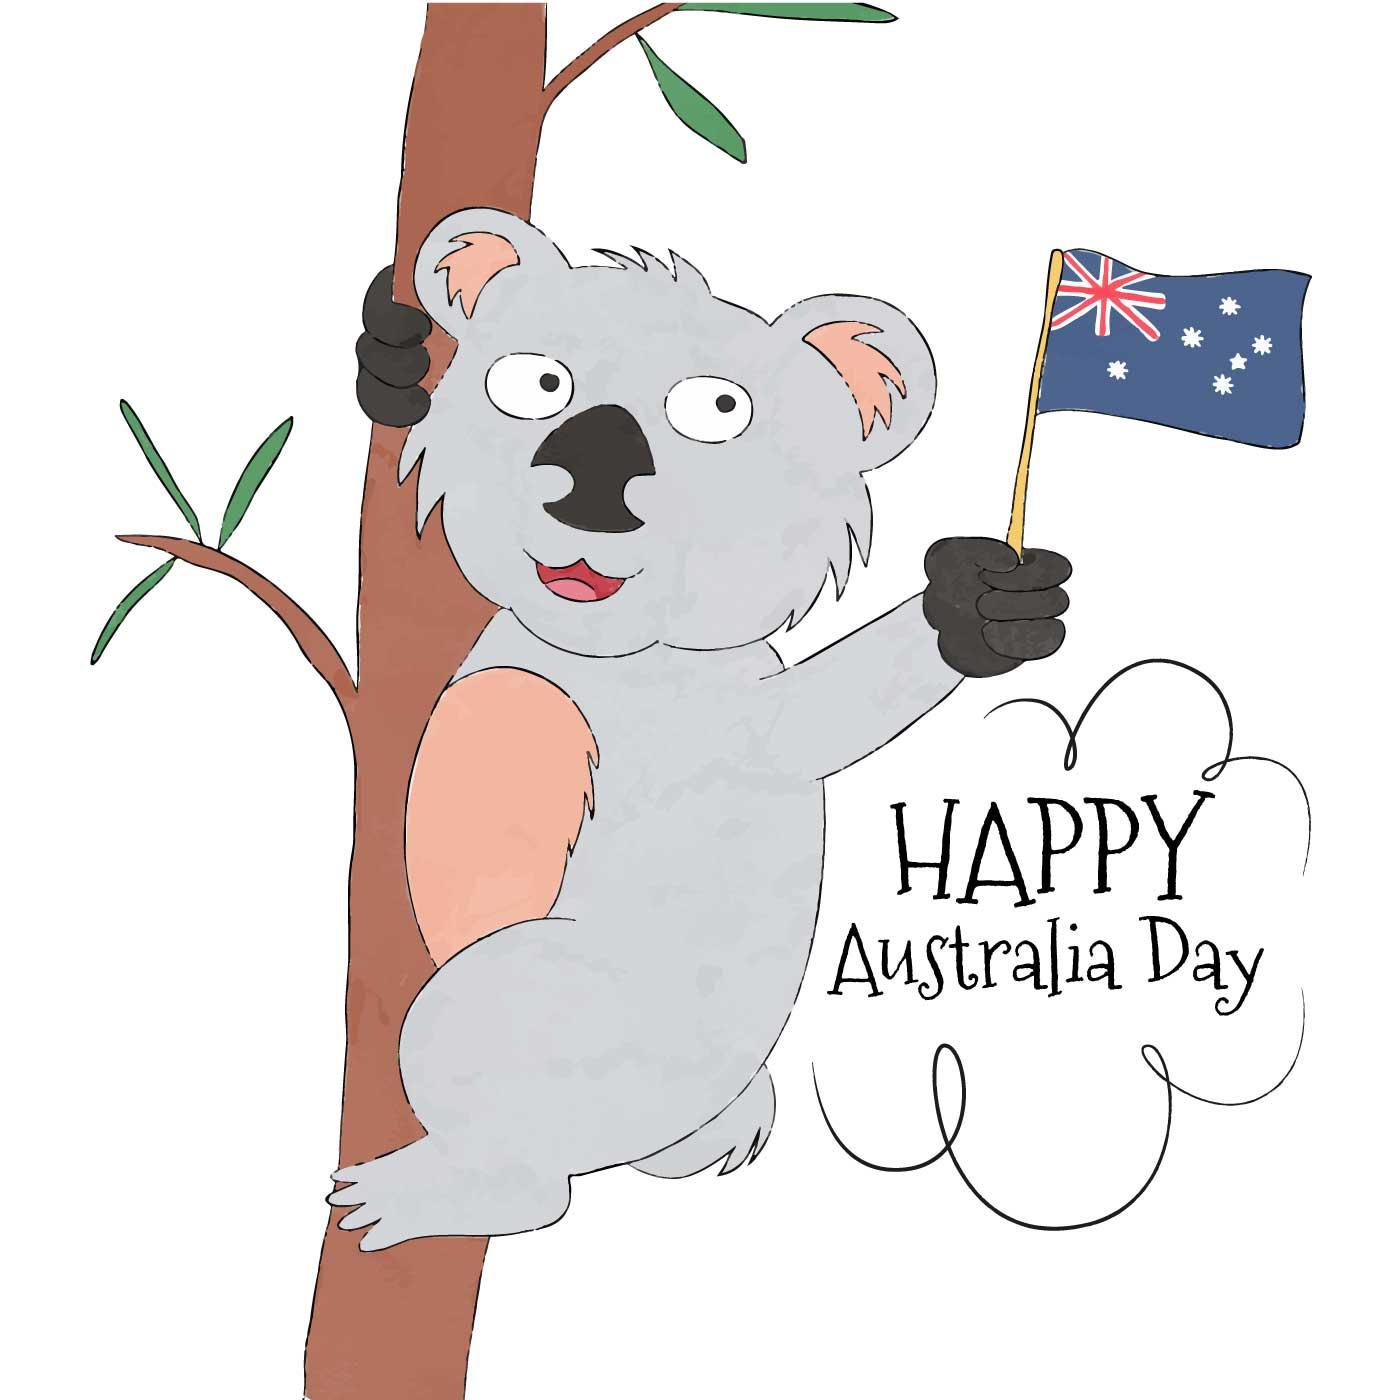 Cute Koala With Australian Flag Download Free Vector Art Stock